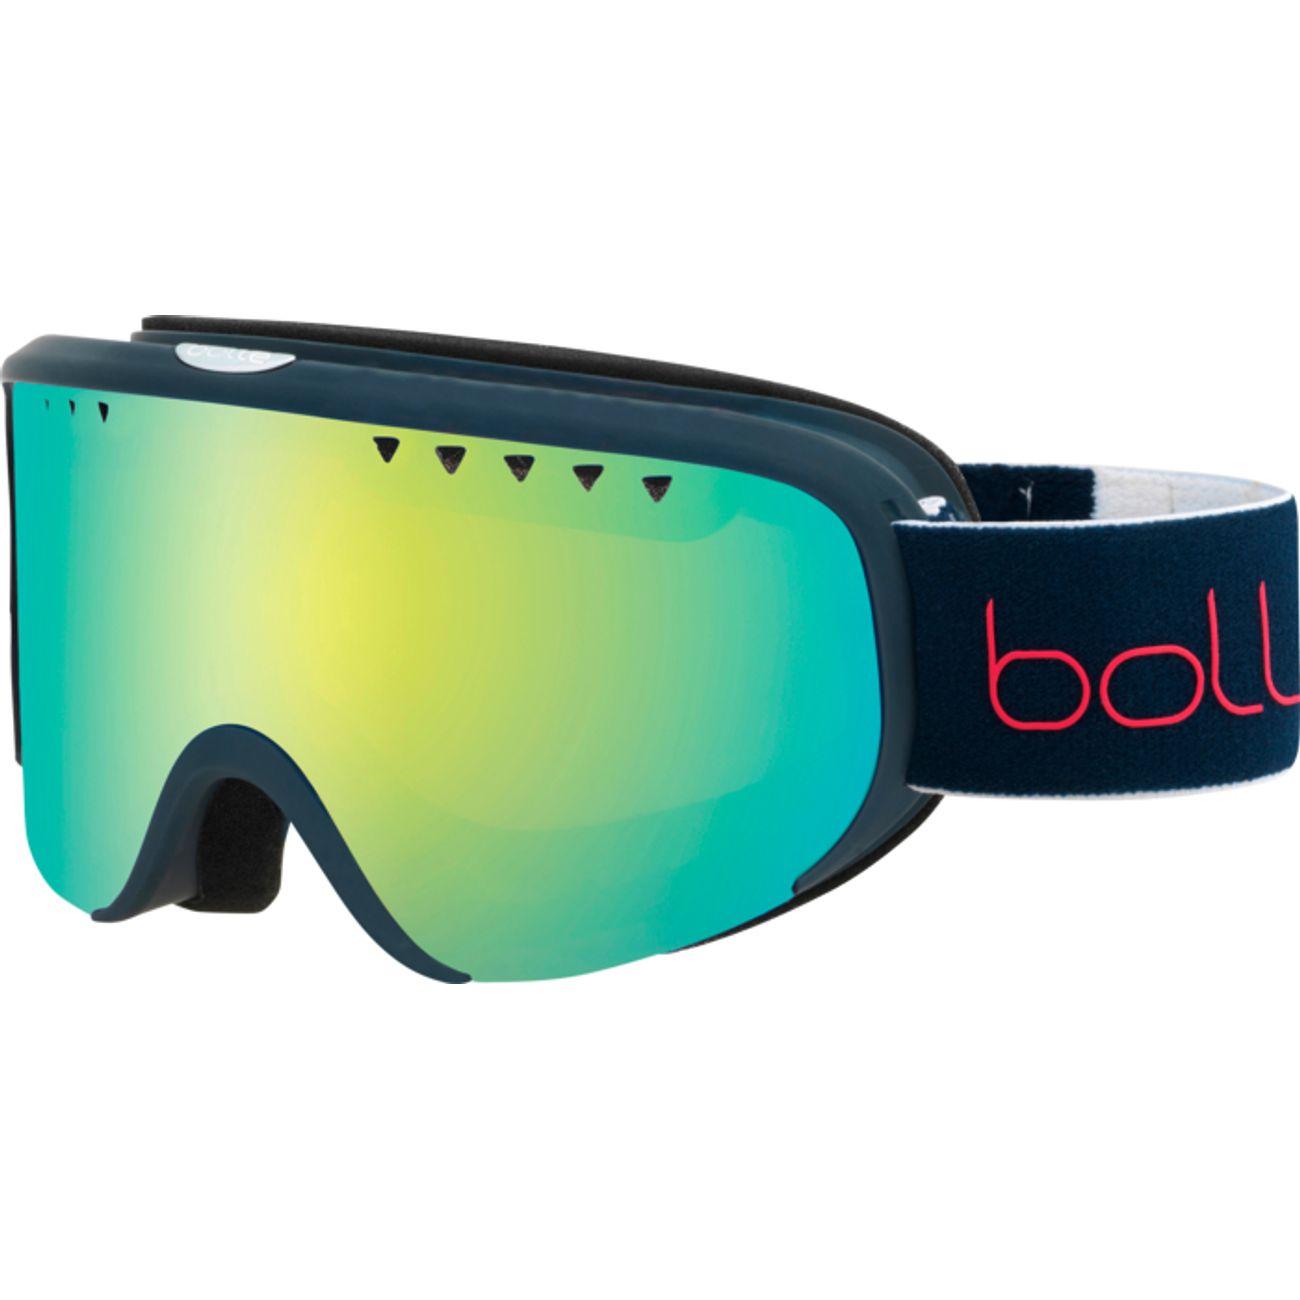 MASQUE Ski mixte BOLLE SCARLETT